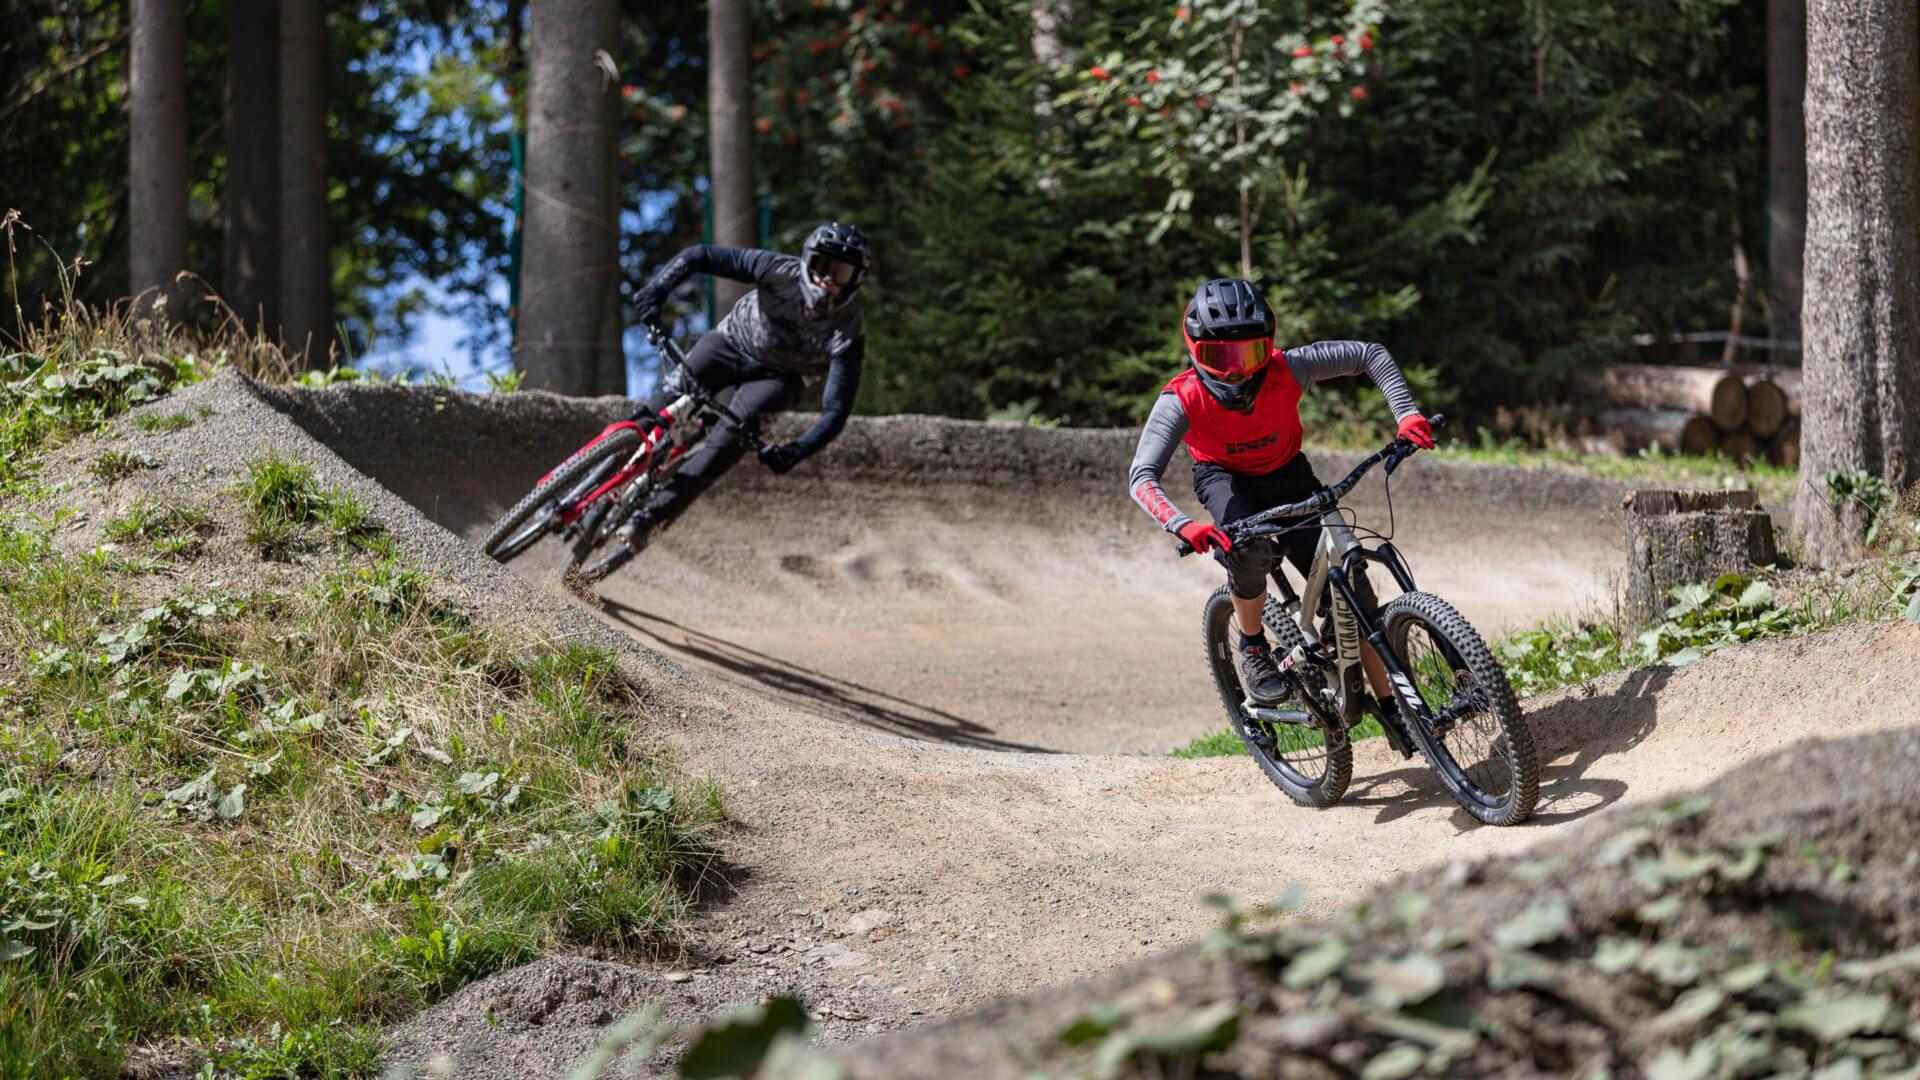 Mountainbike-NRW-in-Winterberg-Sauerland-scaled-e1615813167846